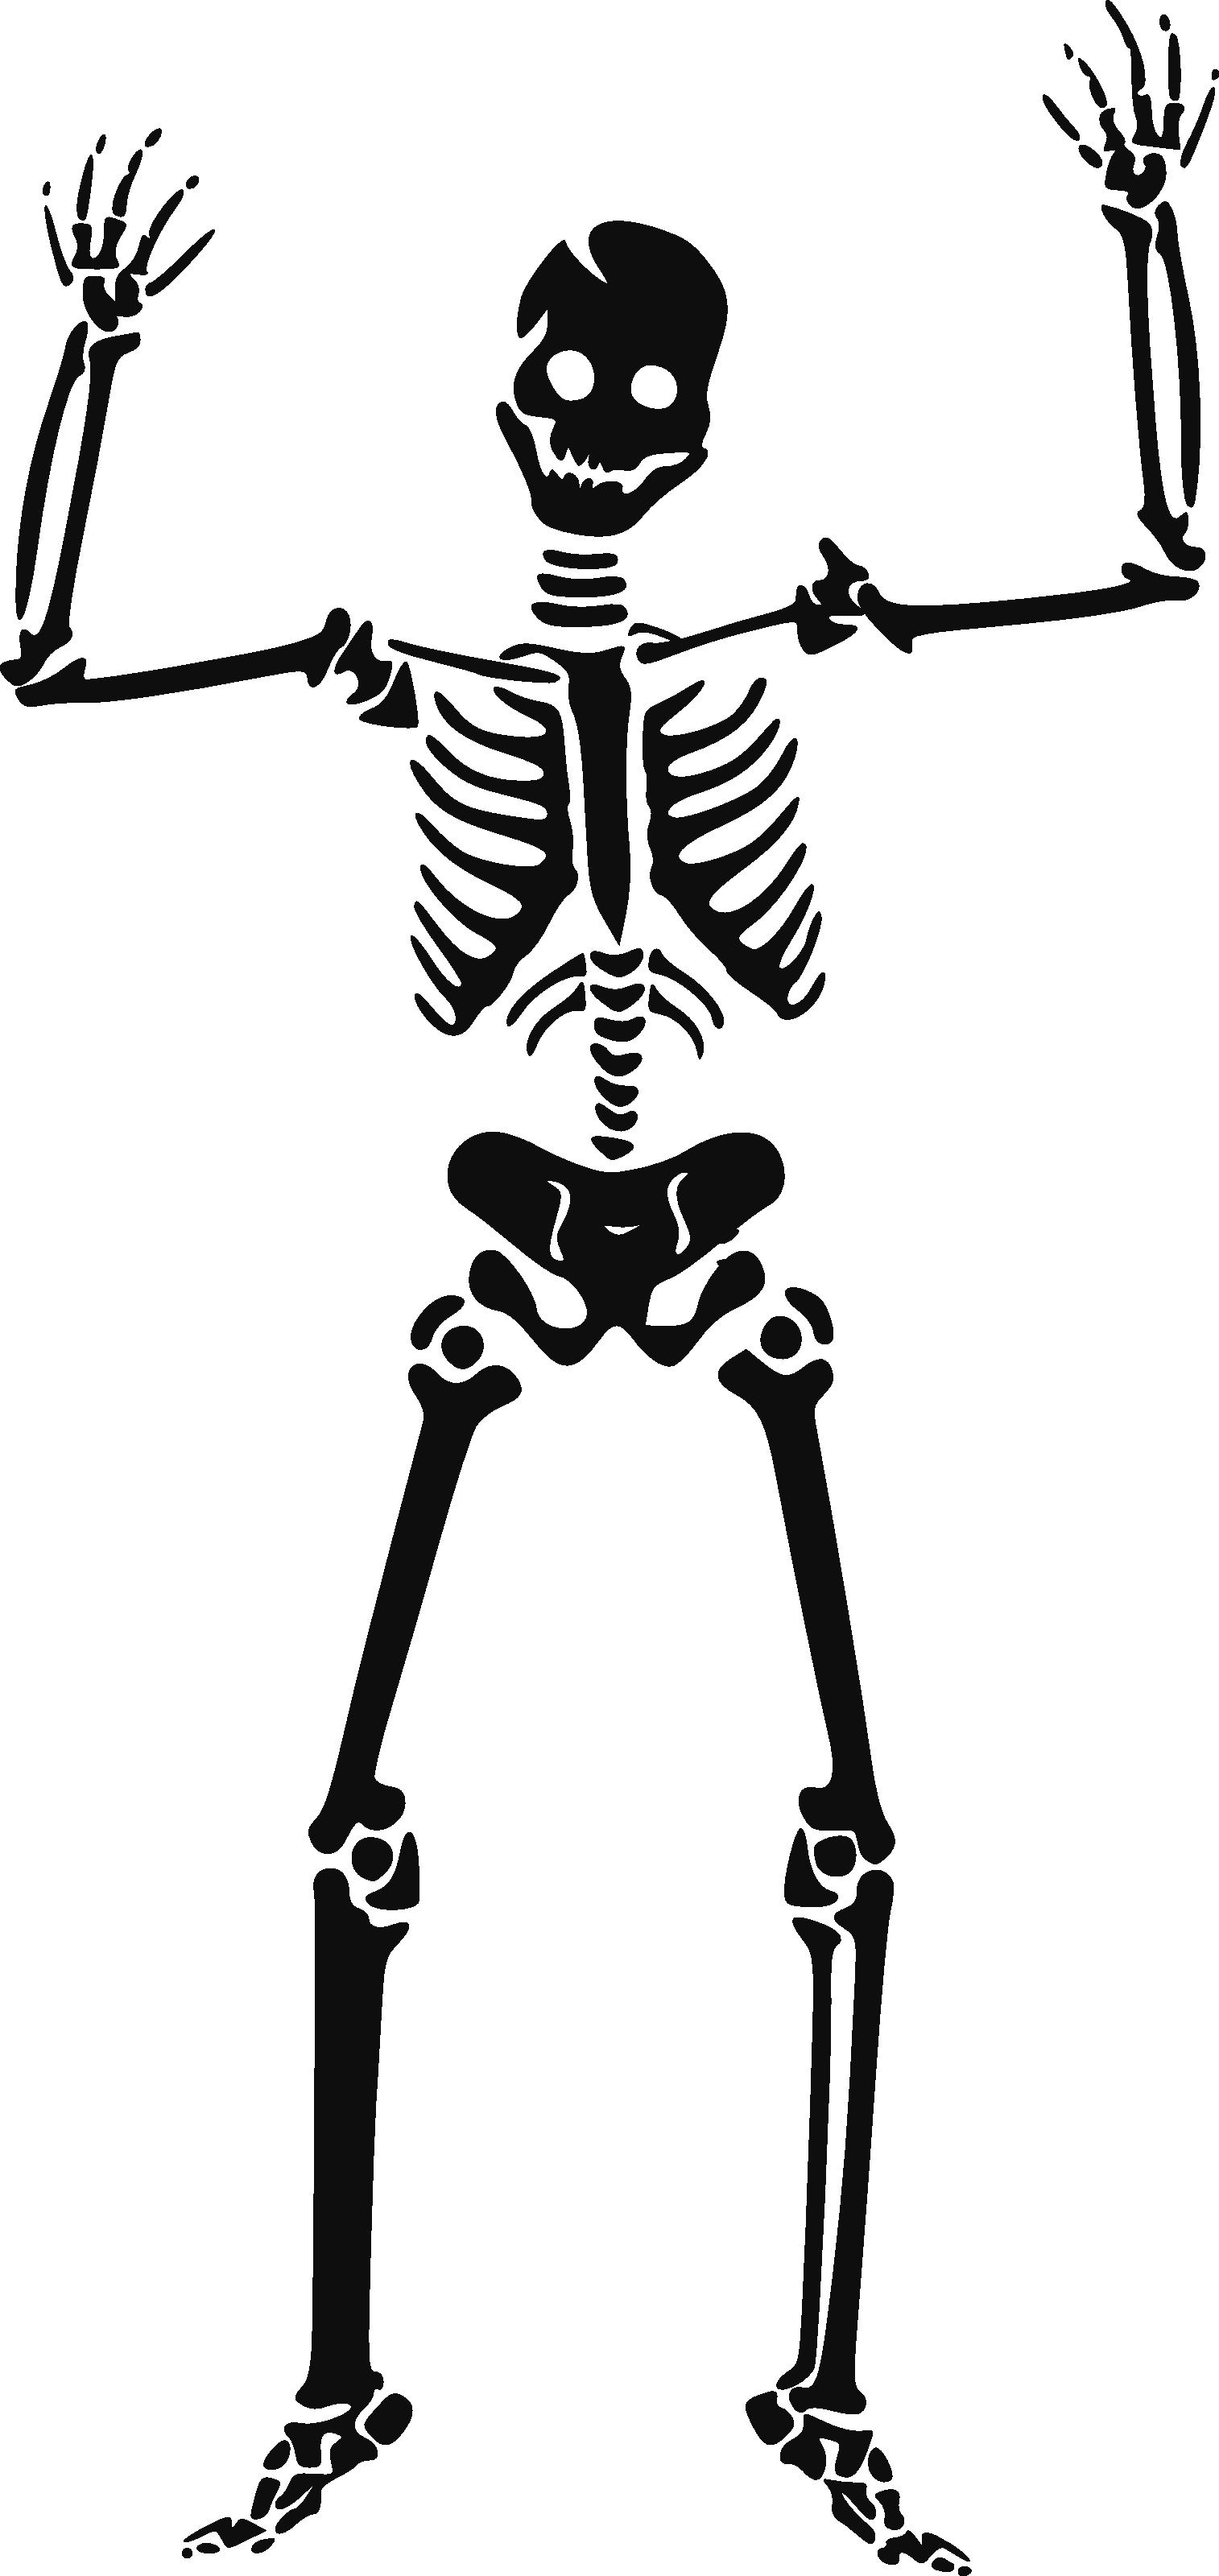 Hands clipart pencil. Bones biology science skeleton